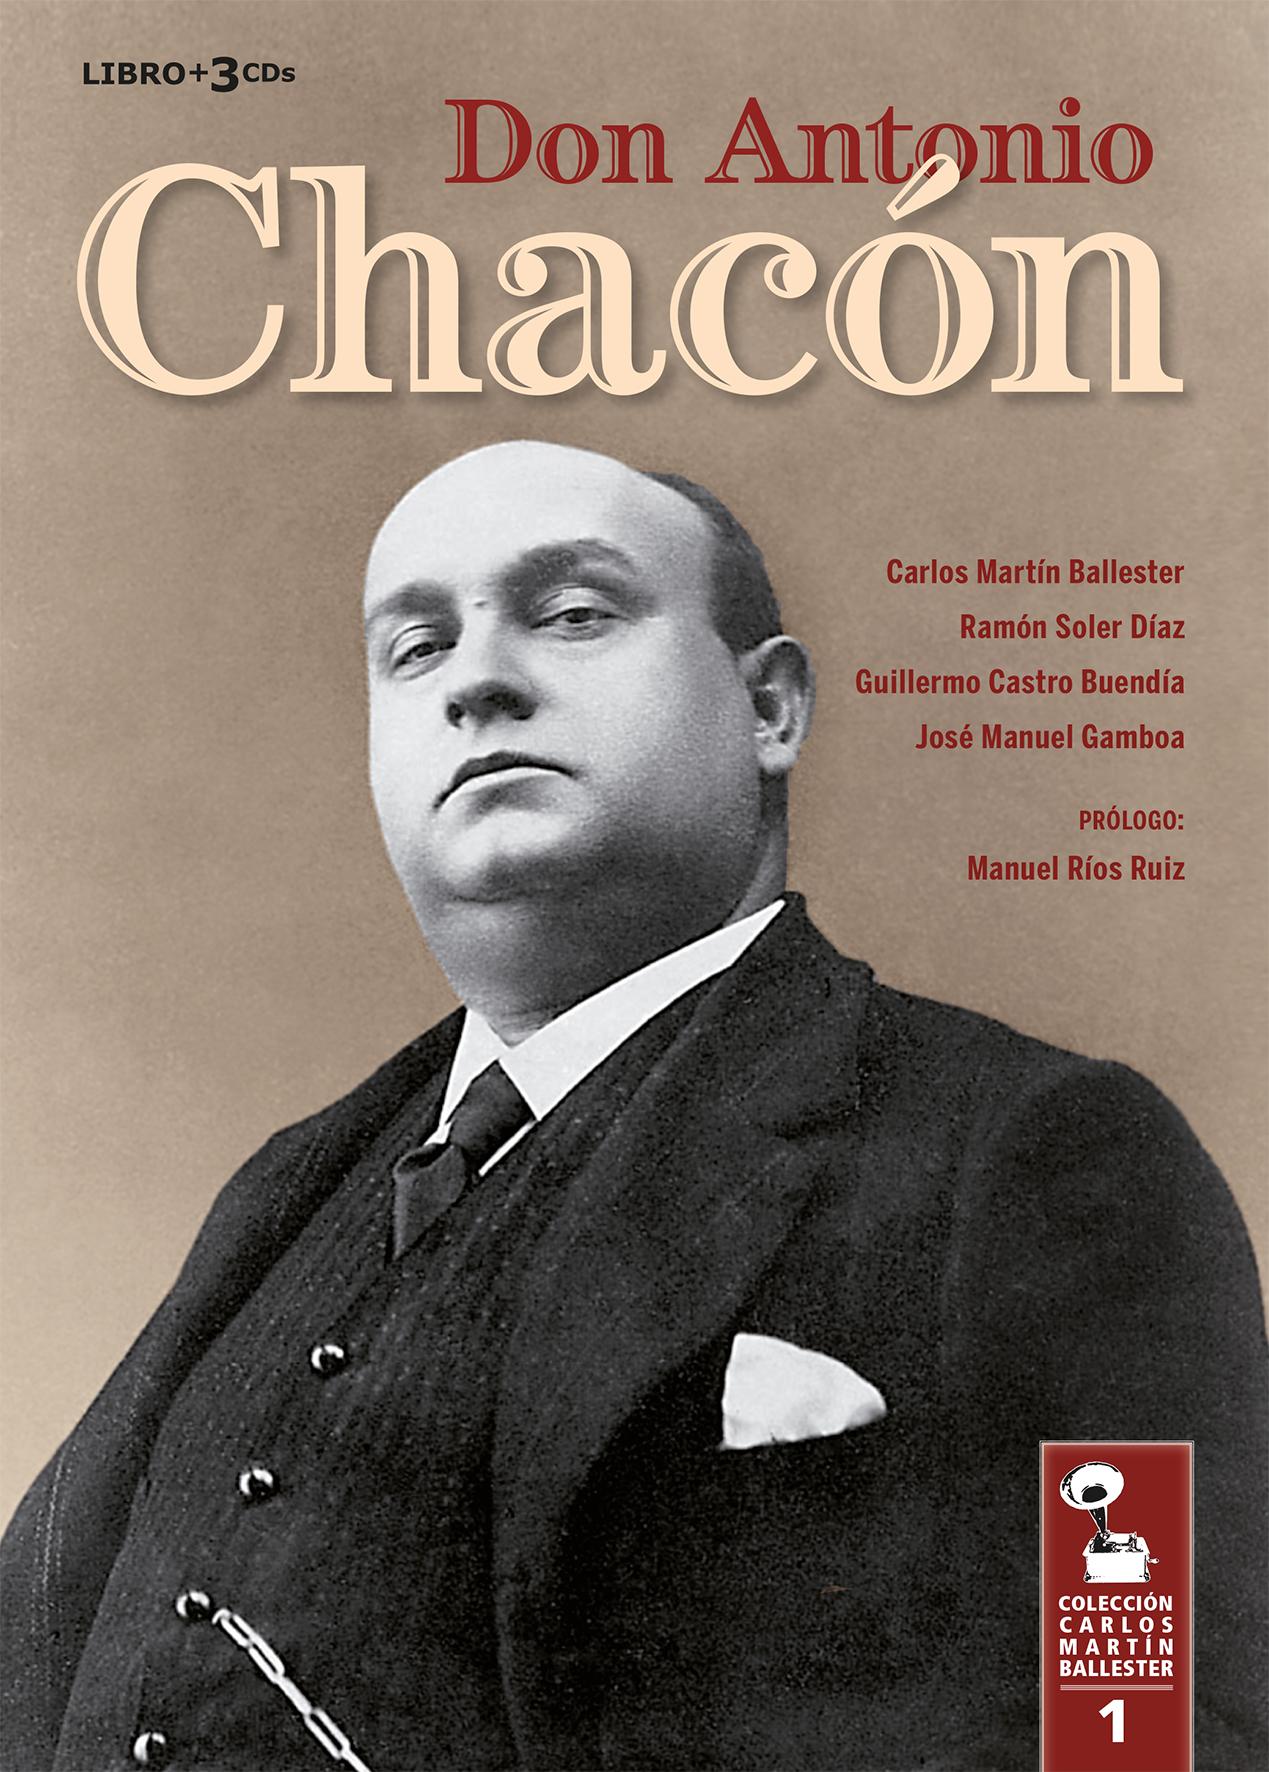 Don Antonio Chacón - Carlos Martín Ballester